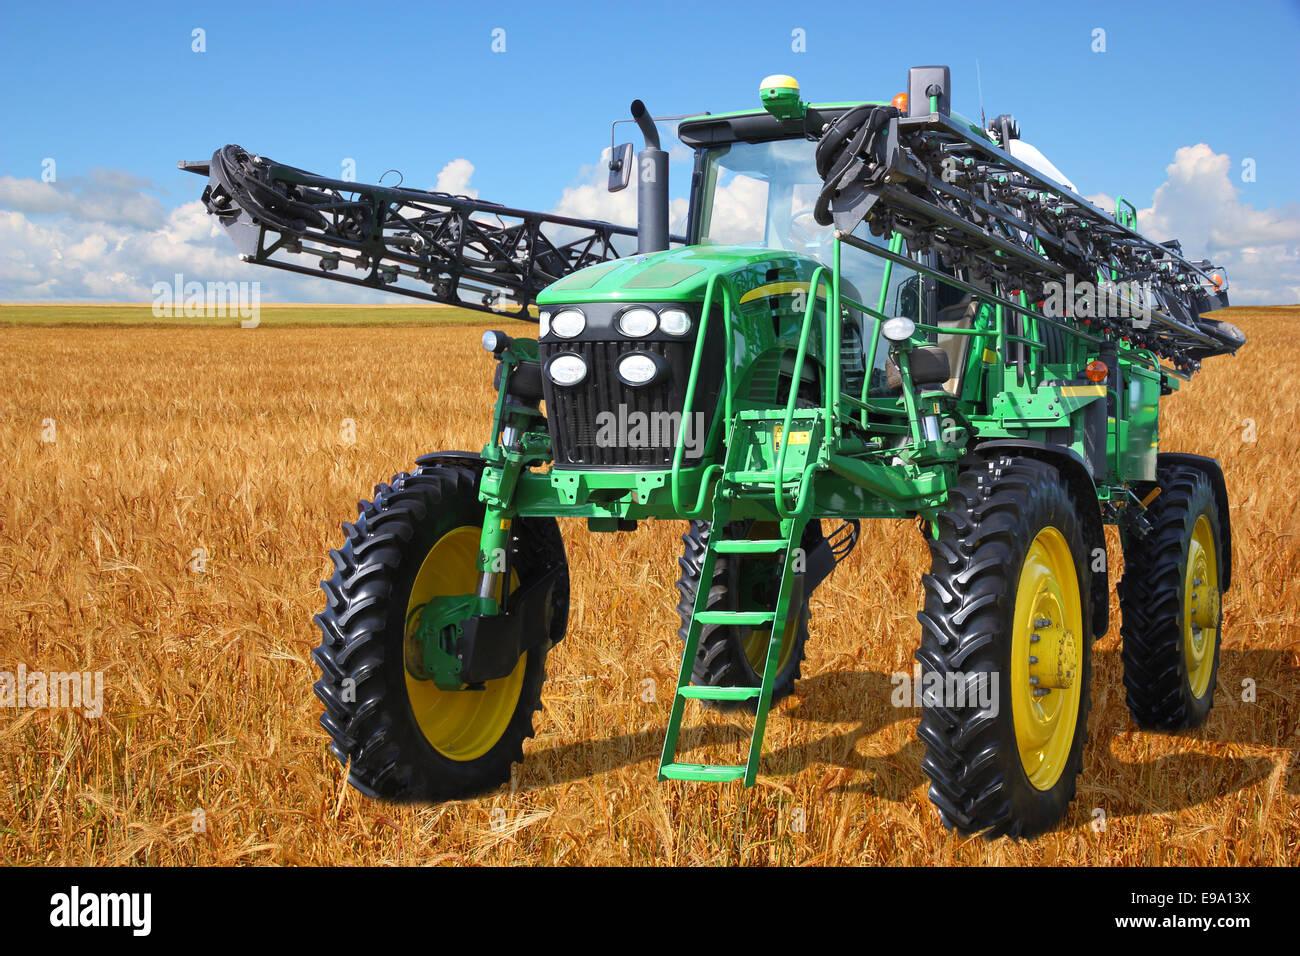 tractor sprayer - Stock Image